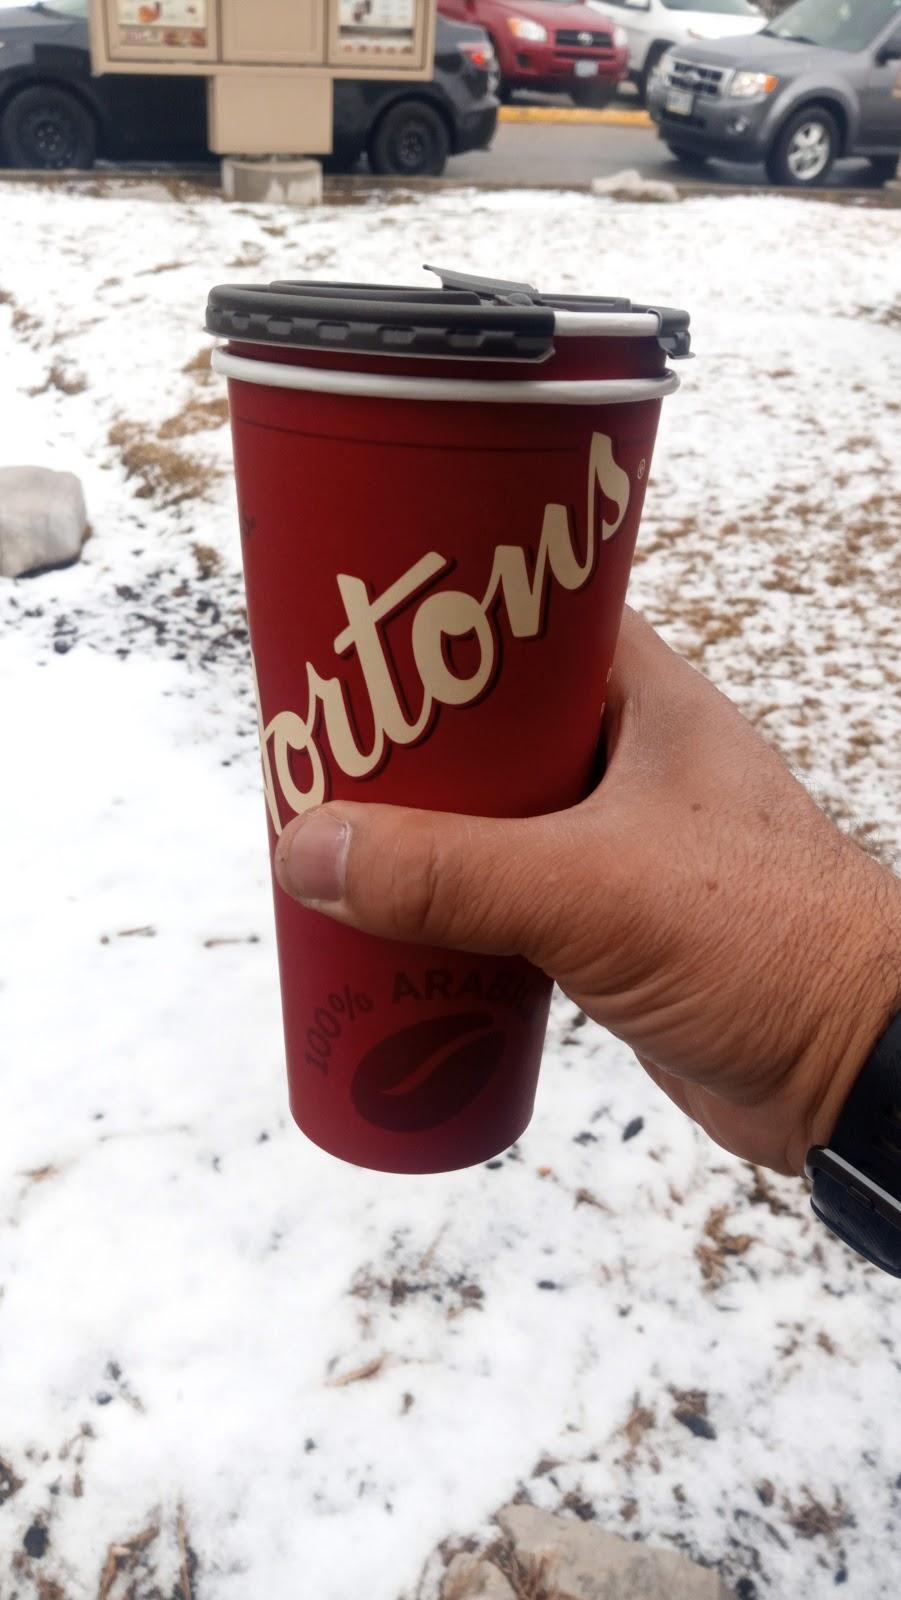 Tim Hortons   cafe   2960 S Sheridan Way, Oakville, ON L6J 7T4, Canada   9058299217 OR +1 905-829-9217